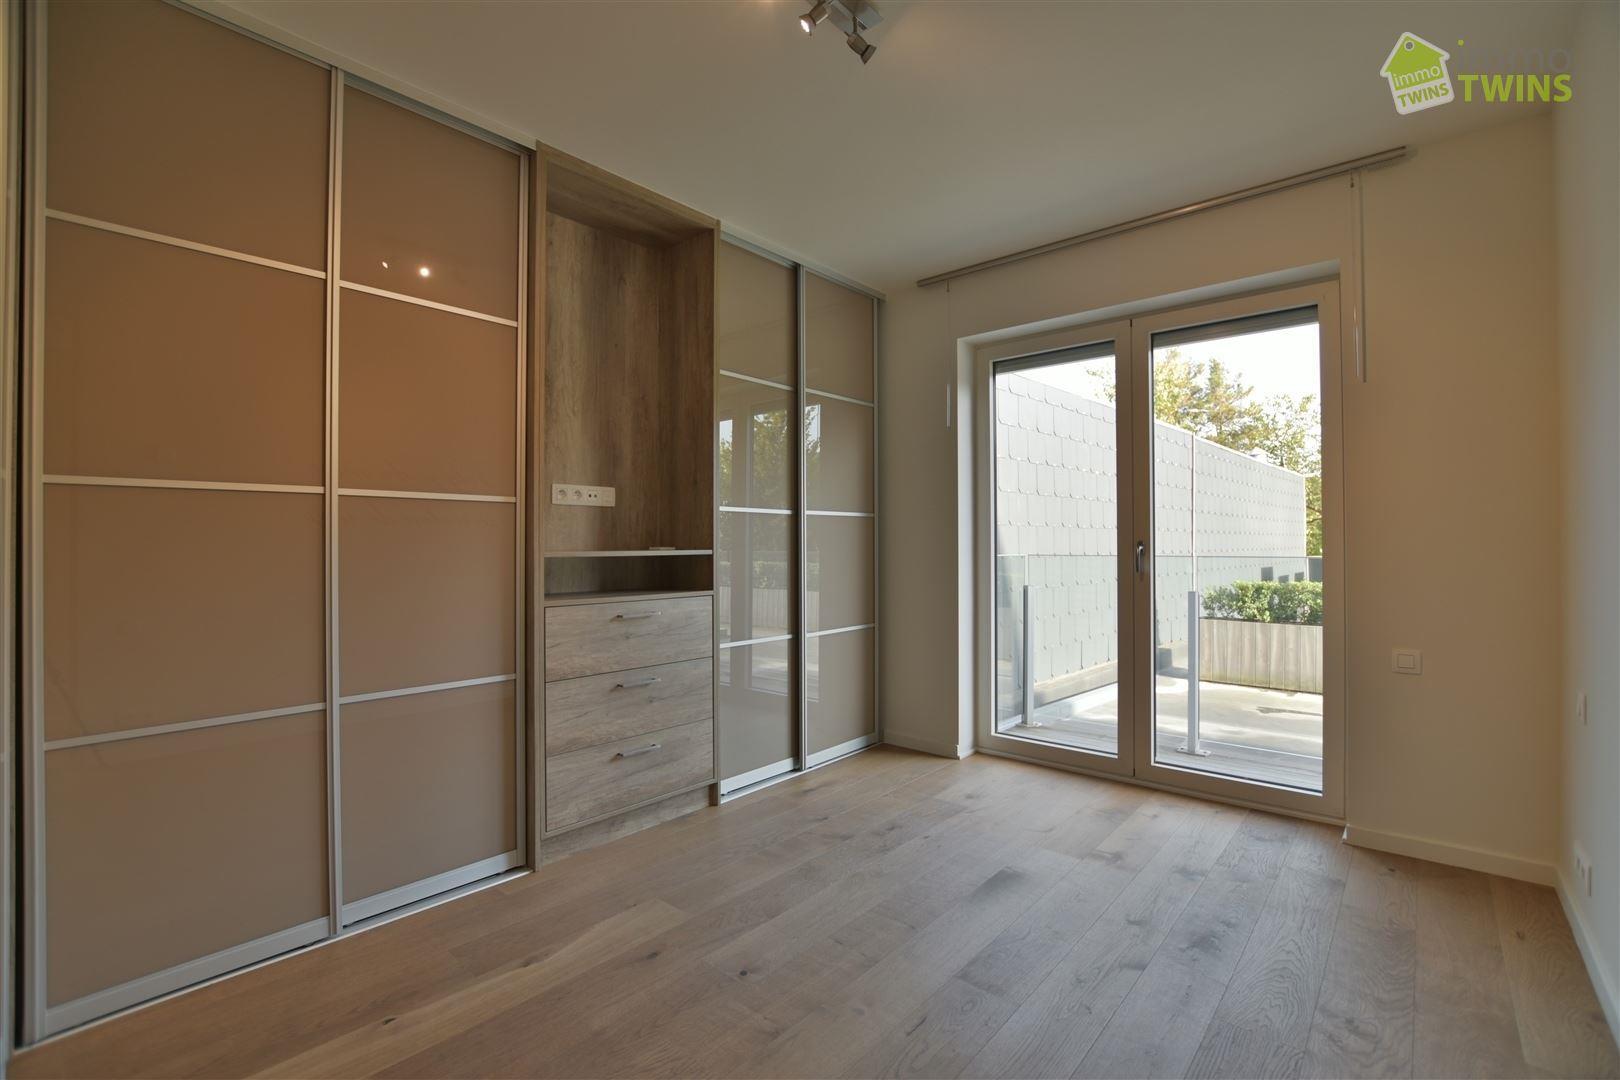 Foto 10 : Appartement te 9200 DENDERMONDE (België) - Prijs € 1.100